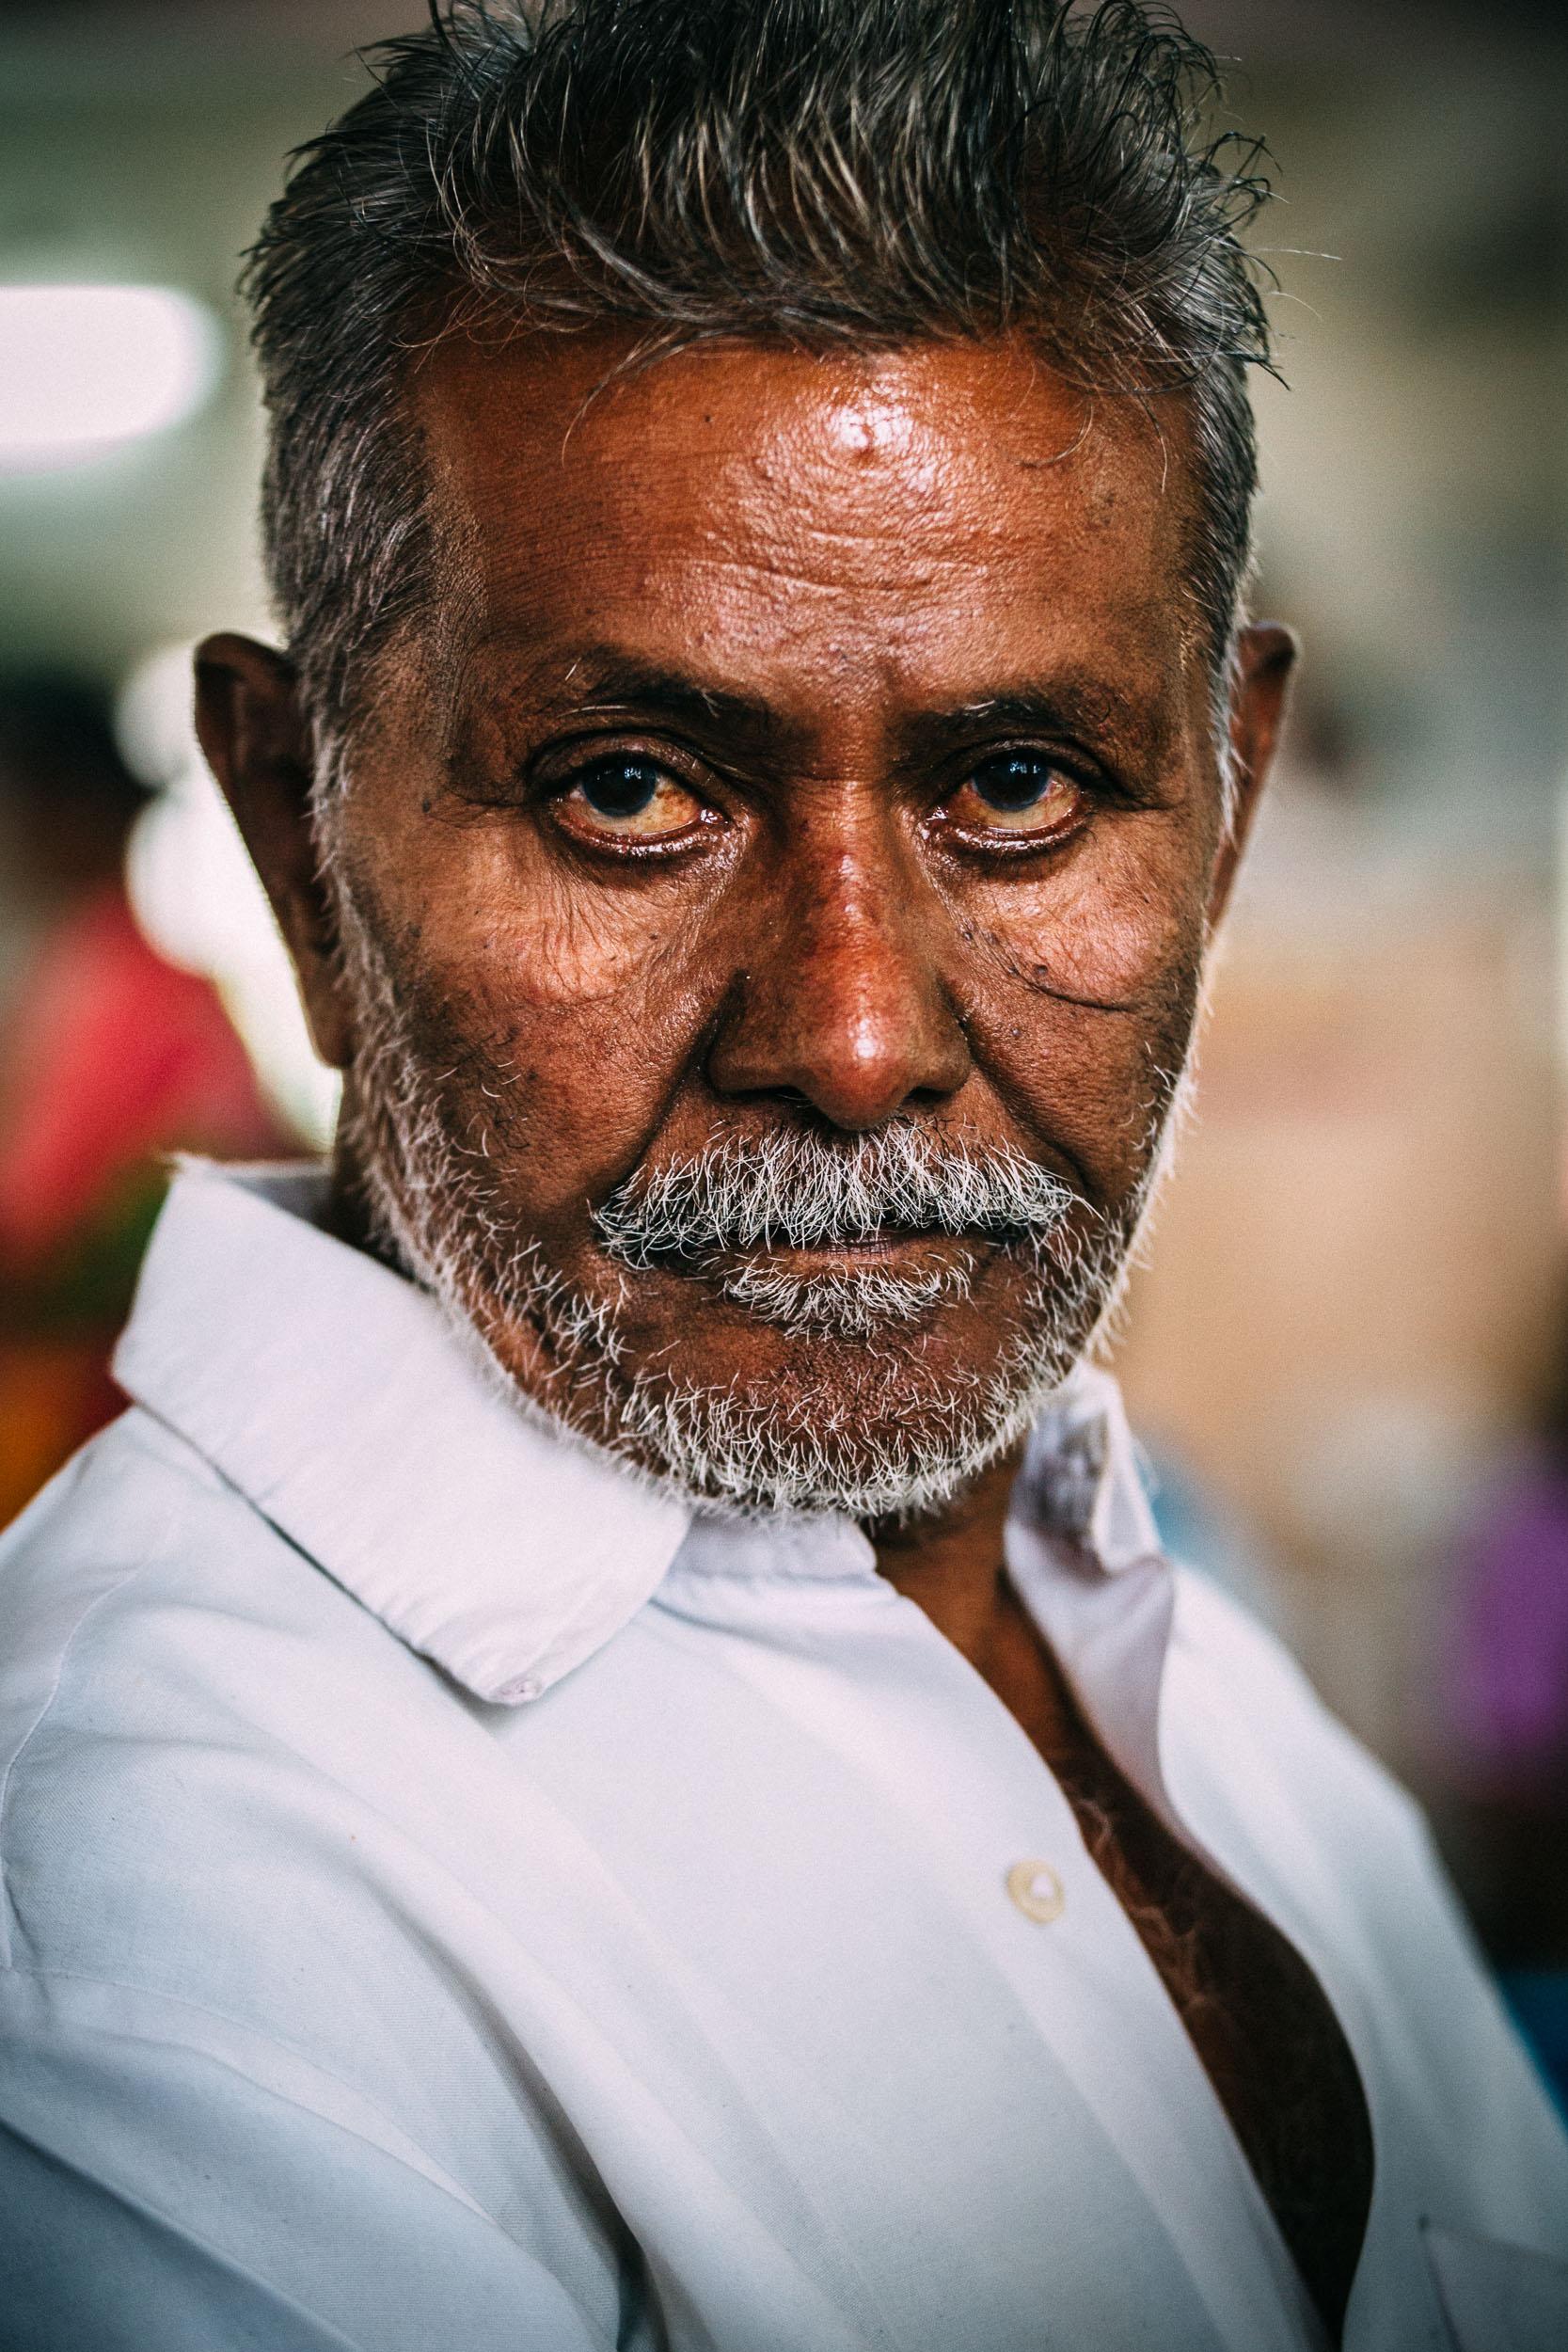 brian-callaway-india-photography-aravind-eye-hospital-01.jpg